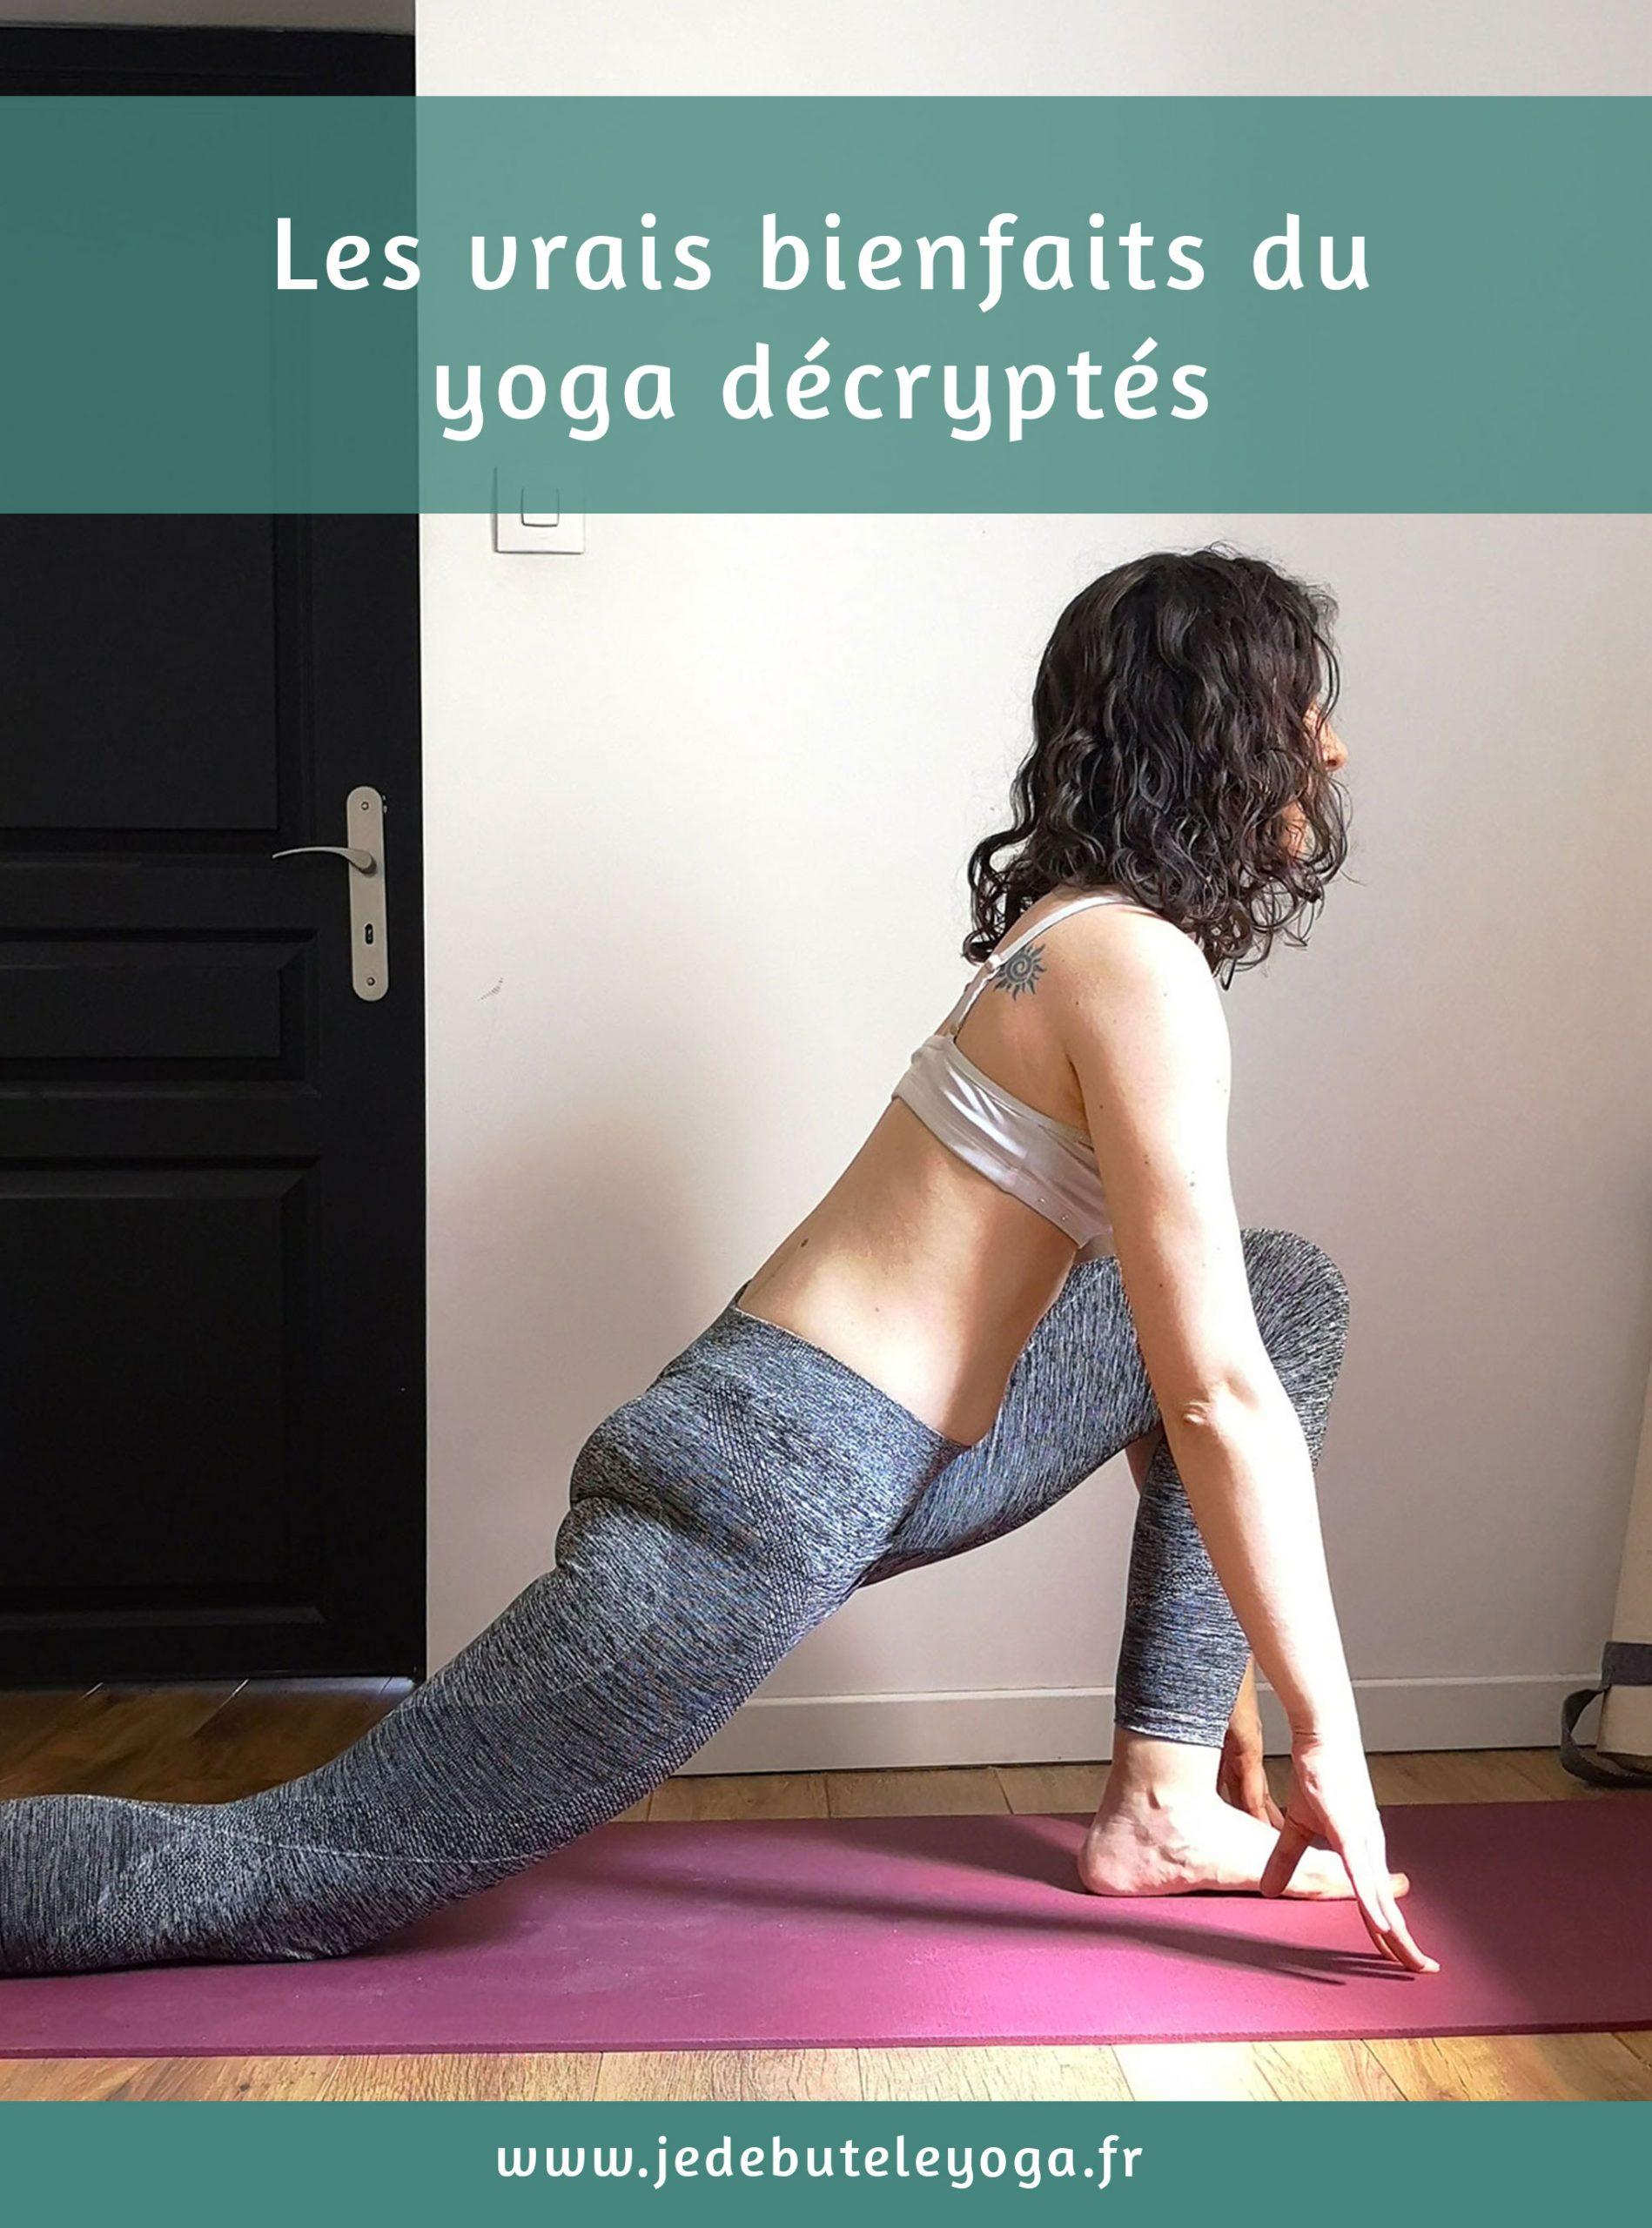 bienfaits du yoga